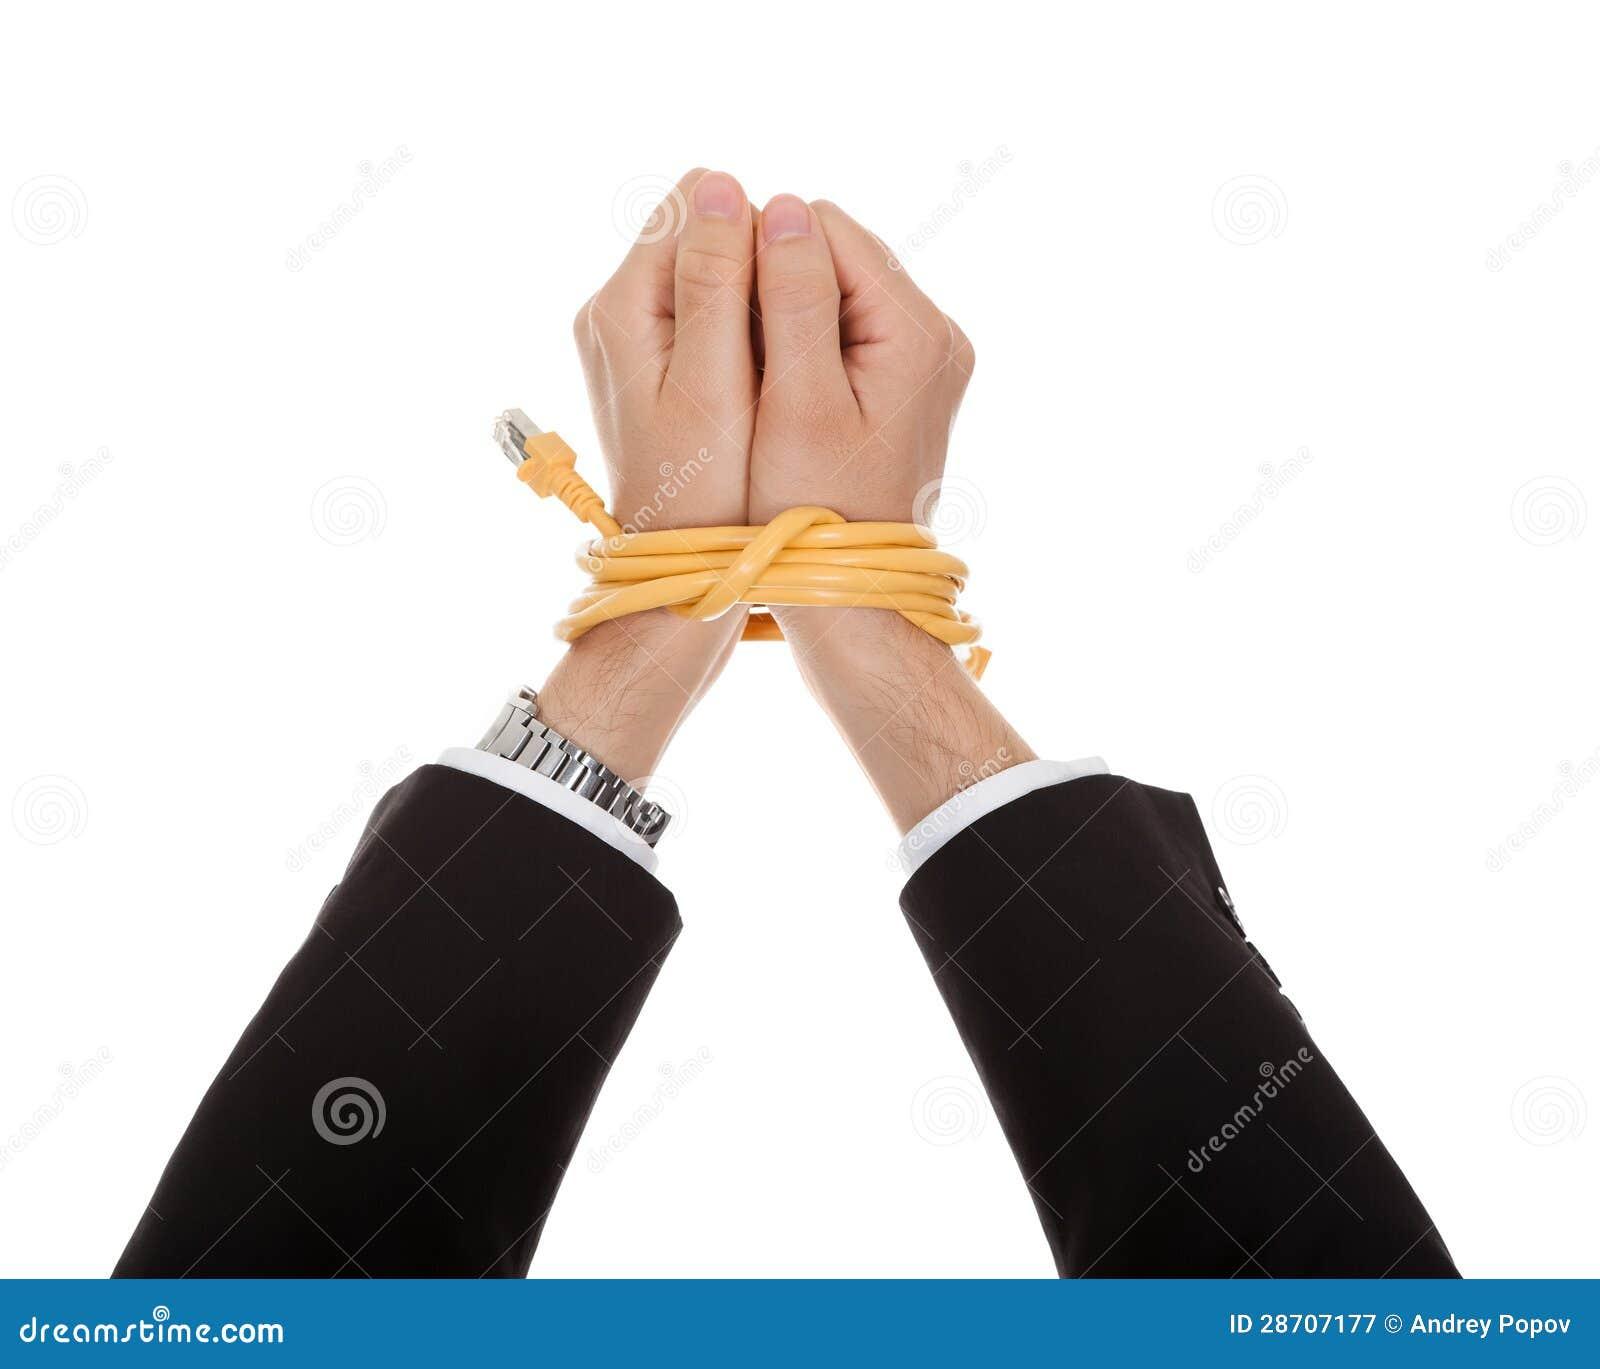 Связали руки онлайн 19 фотография